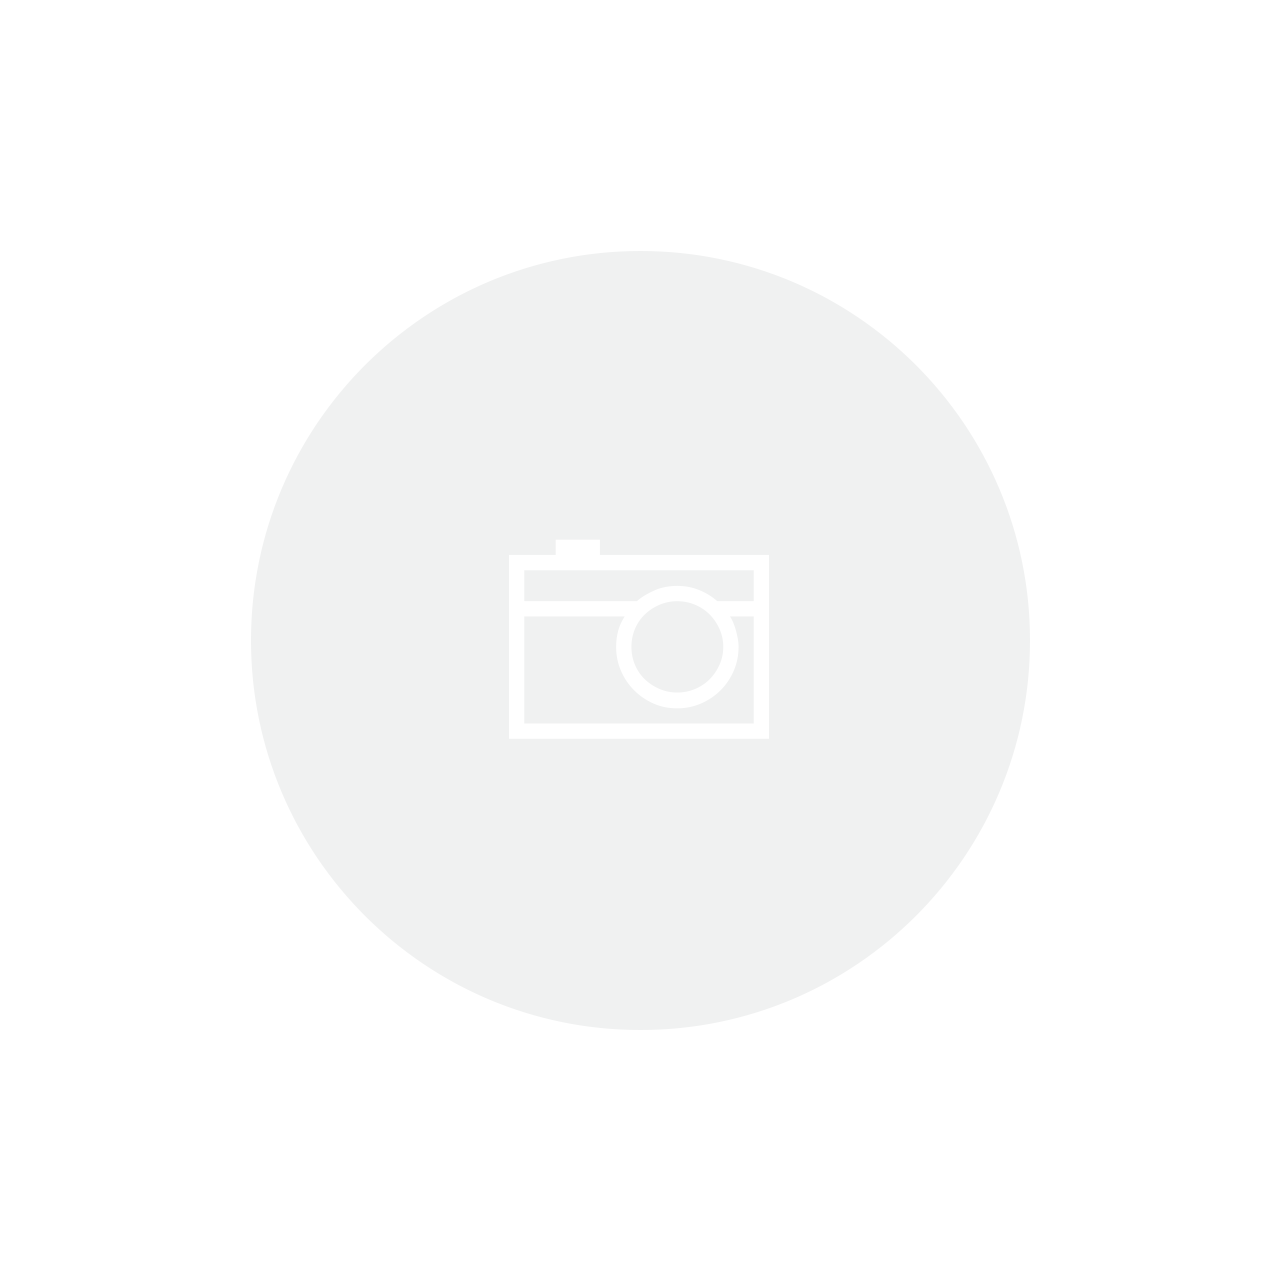 Fôrma Redonda com Tubo Fechado Antiaderente 24 cm Tramontina